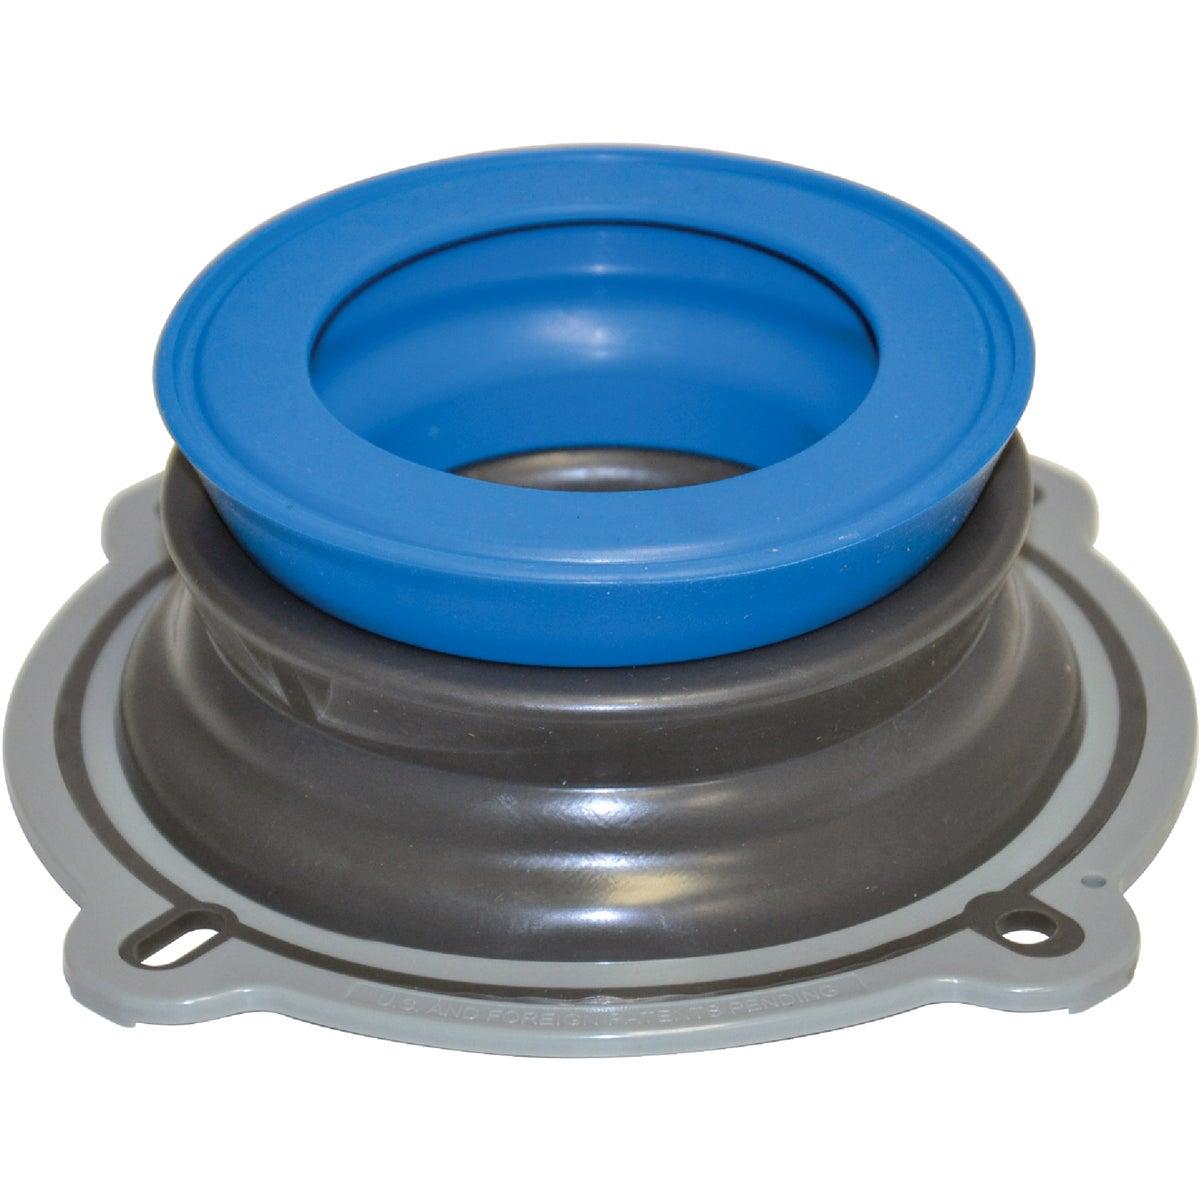 Toilet Seal Kit